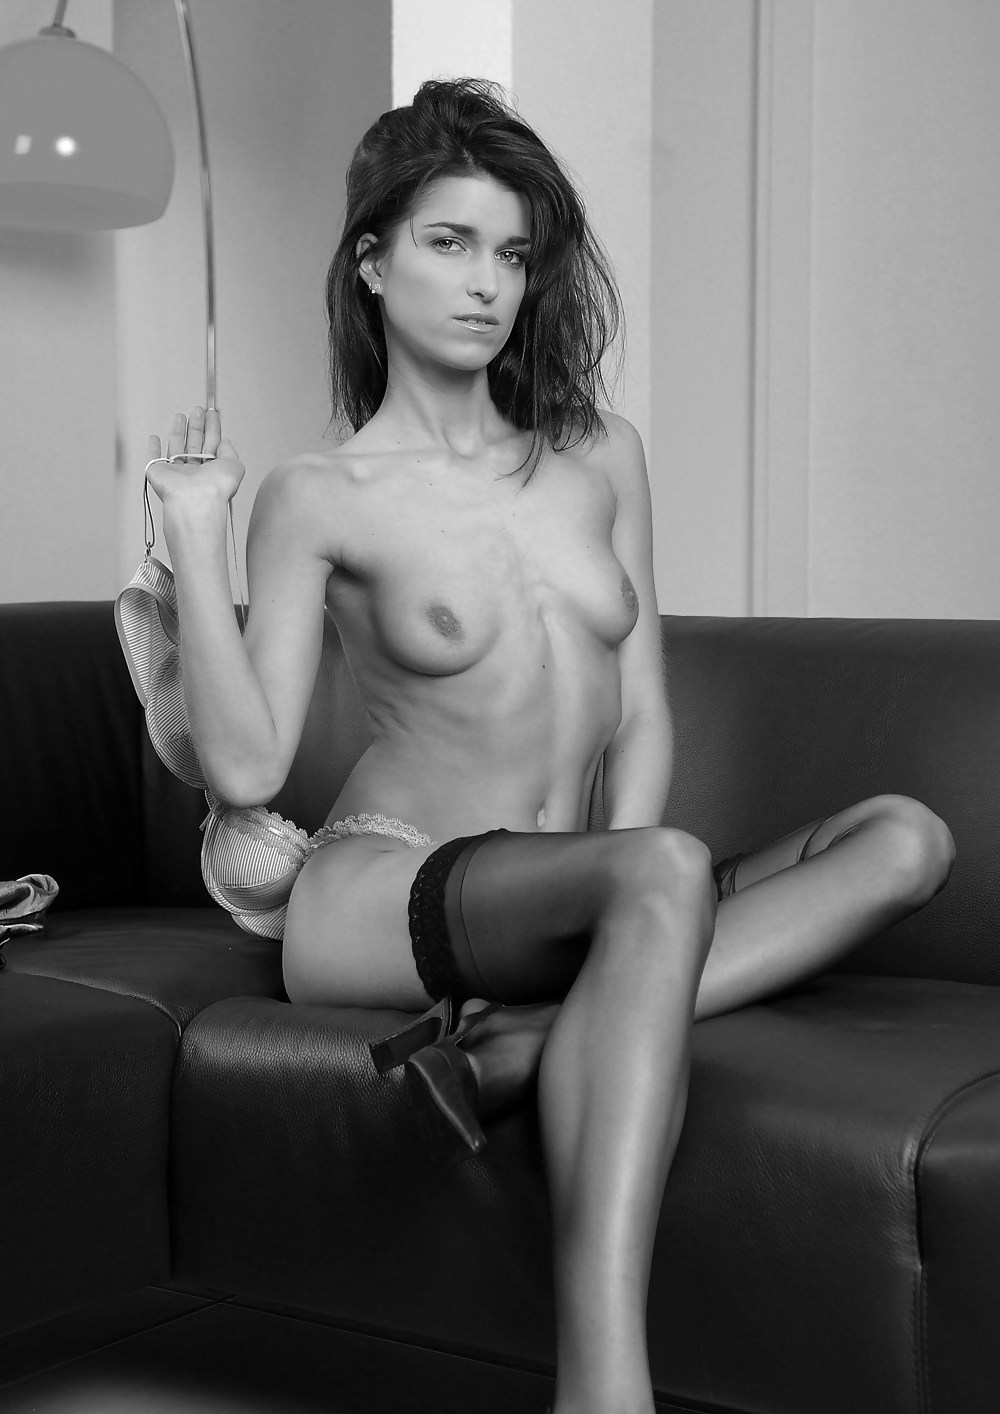 Free nude pics of claudia black — photo 11